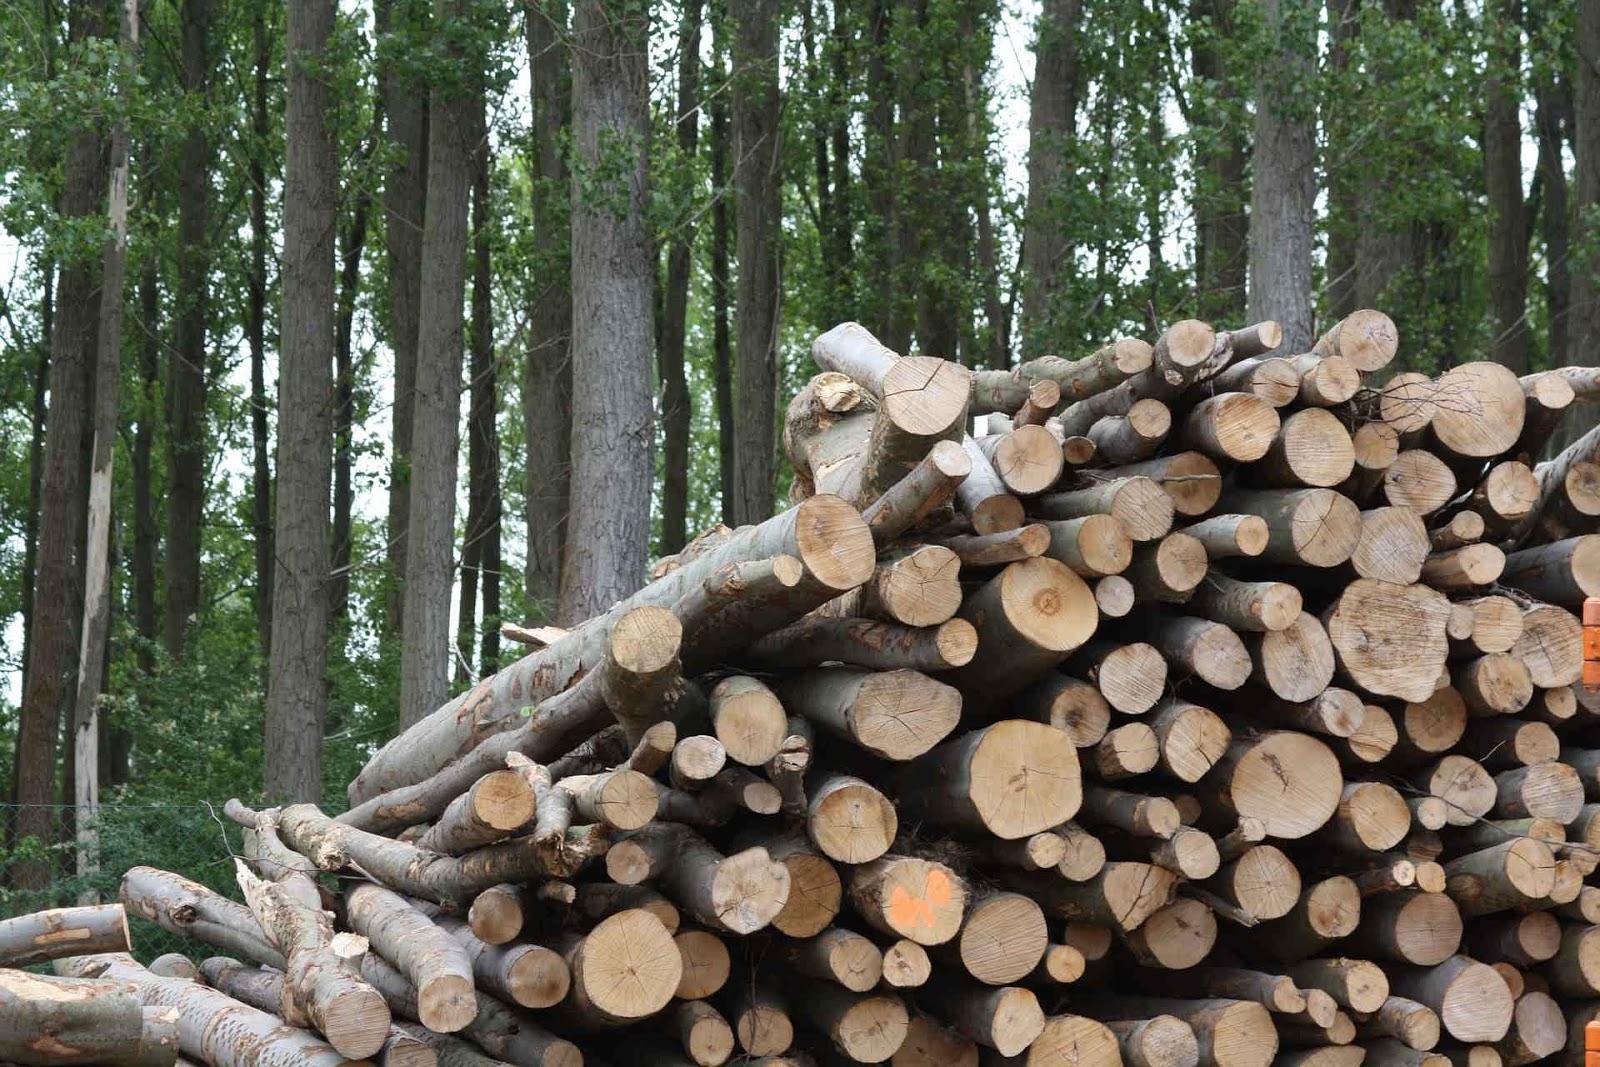 Biomass explanation